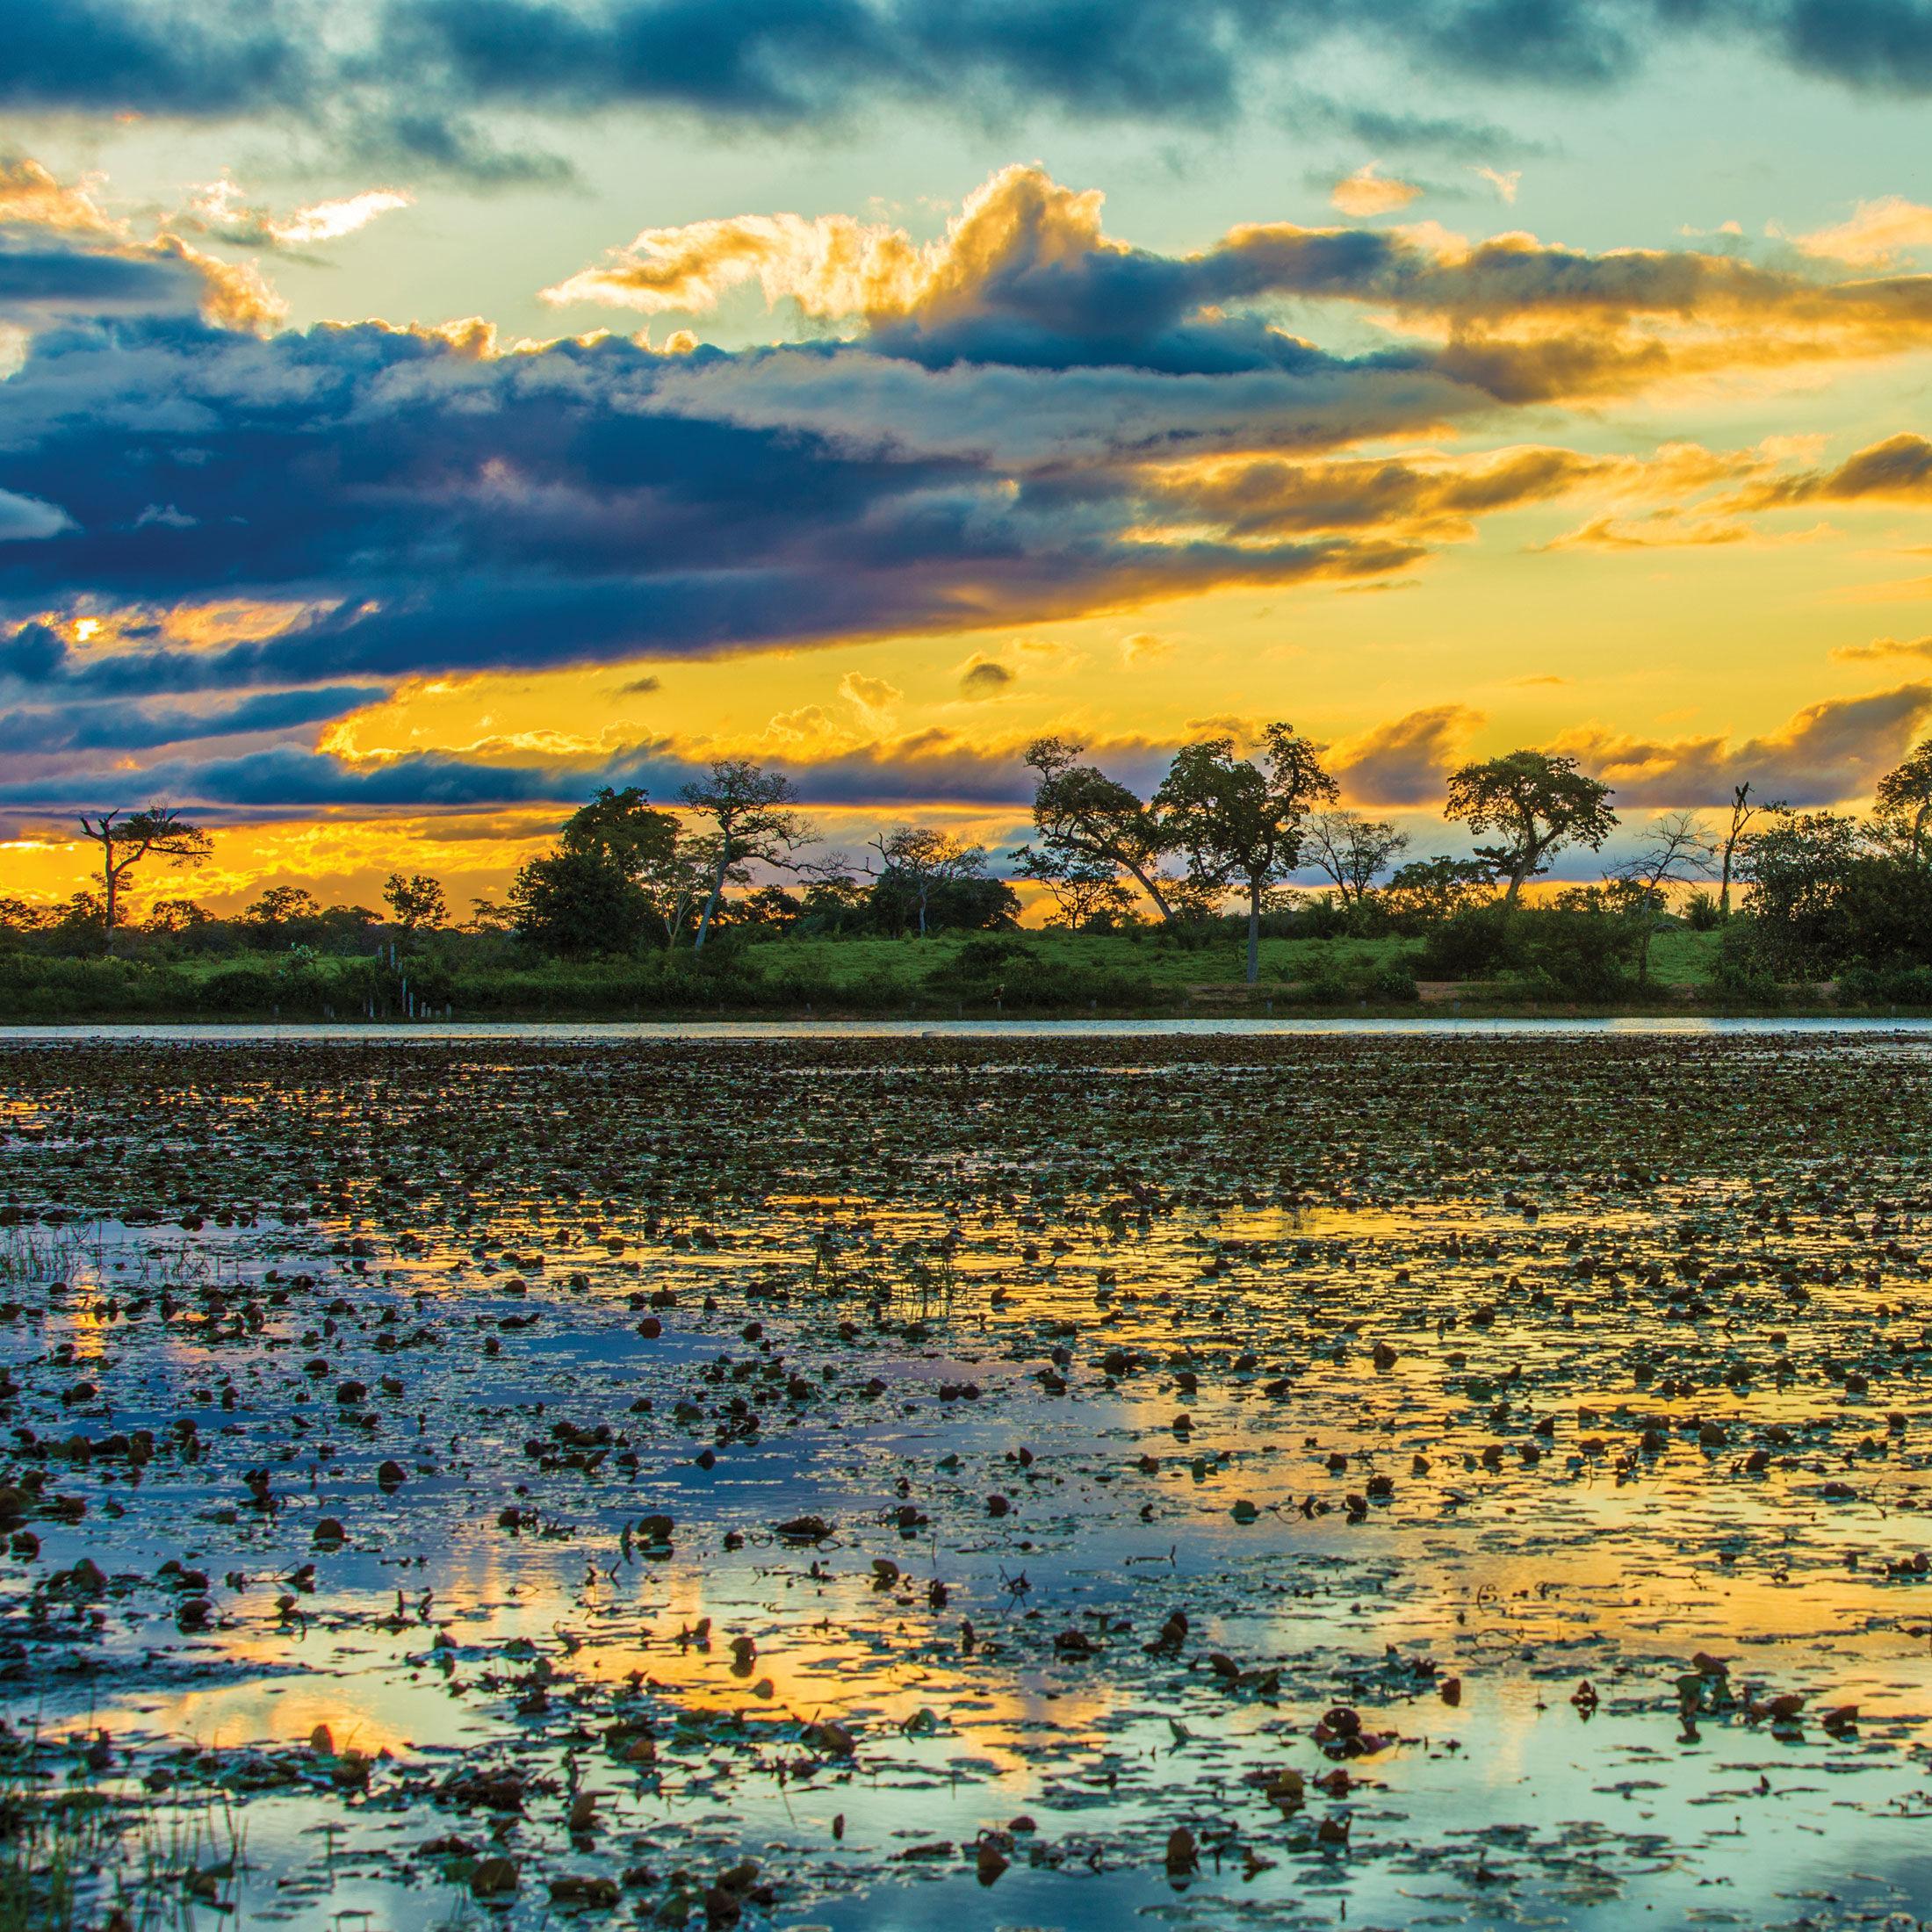 Everglades sunset qe8fpa